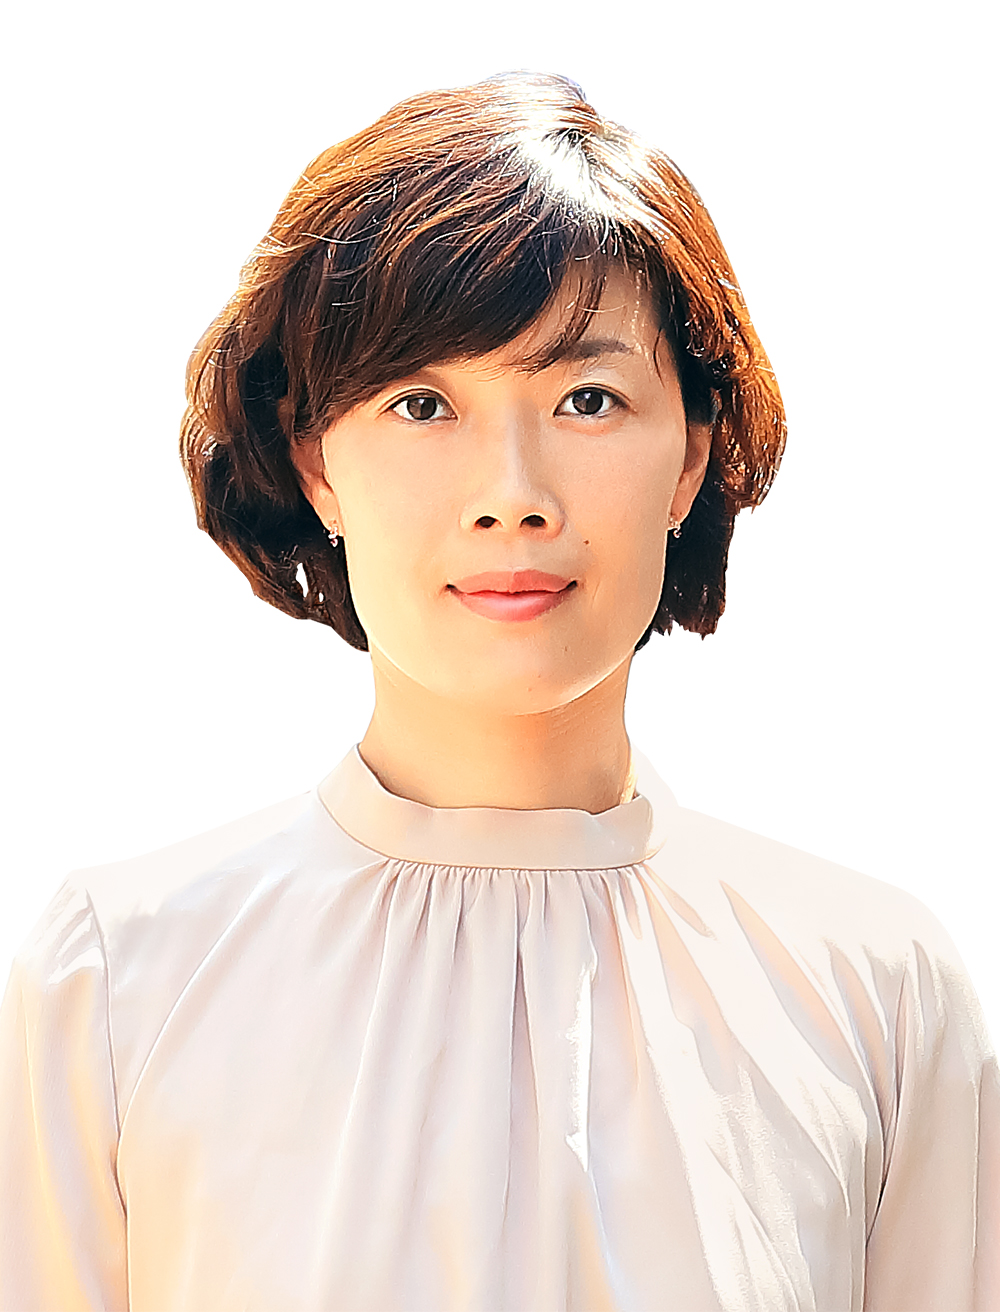 Profile photo01